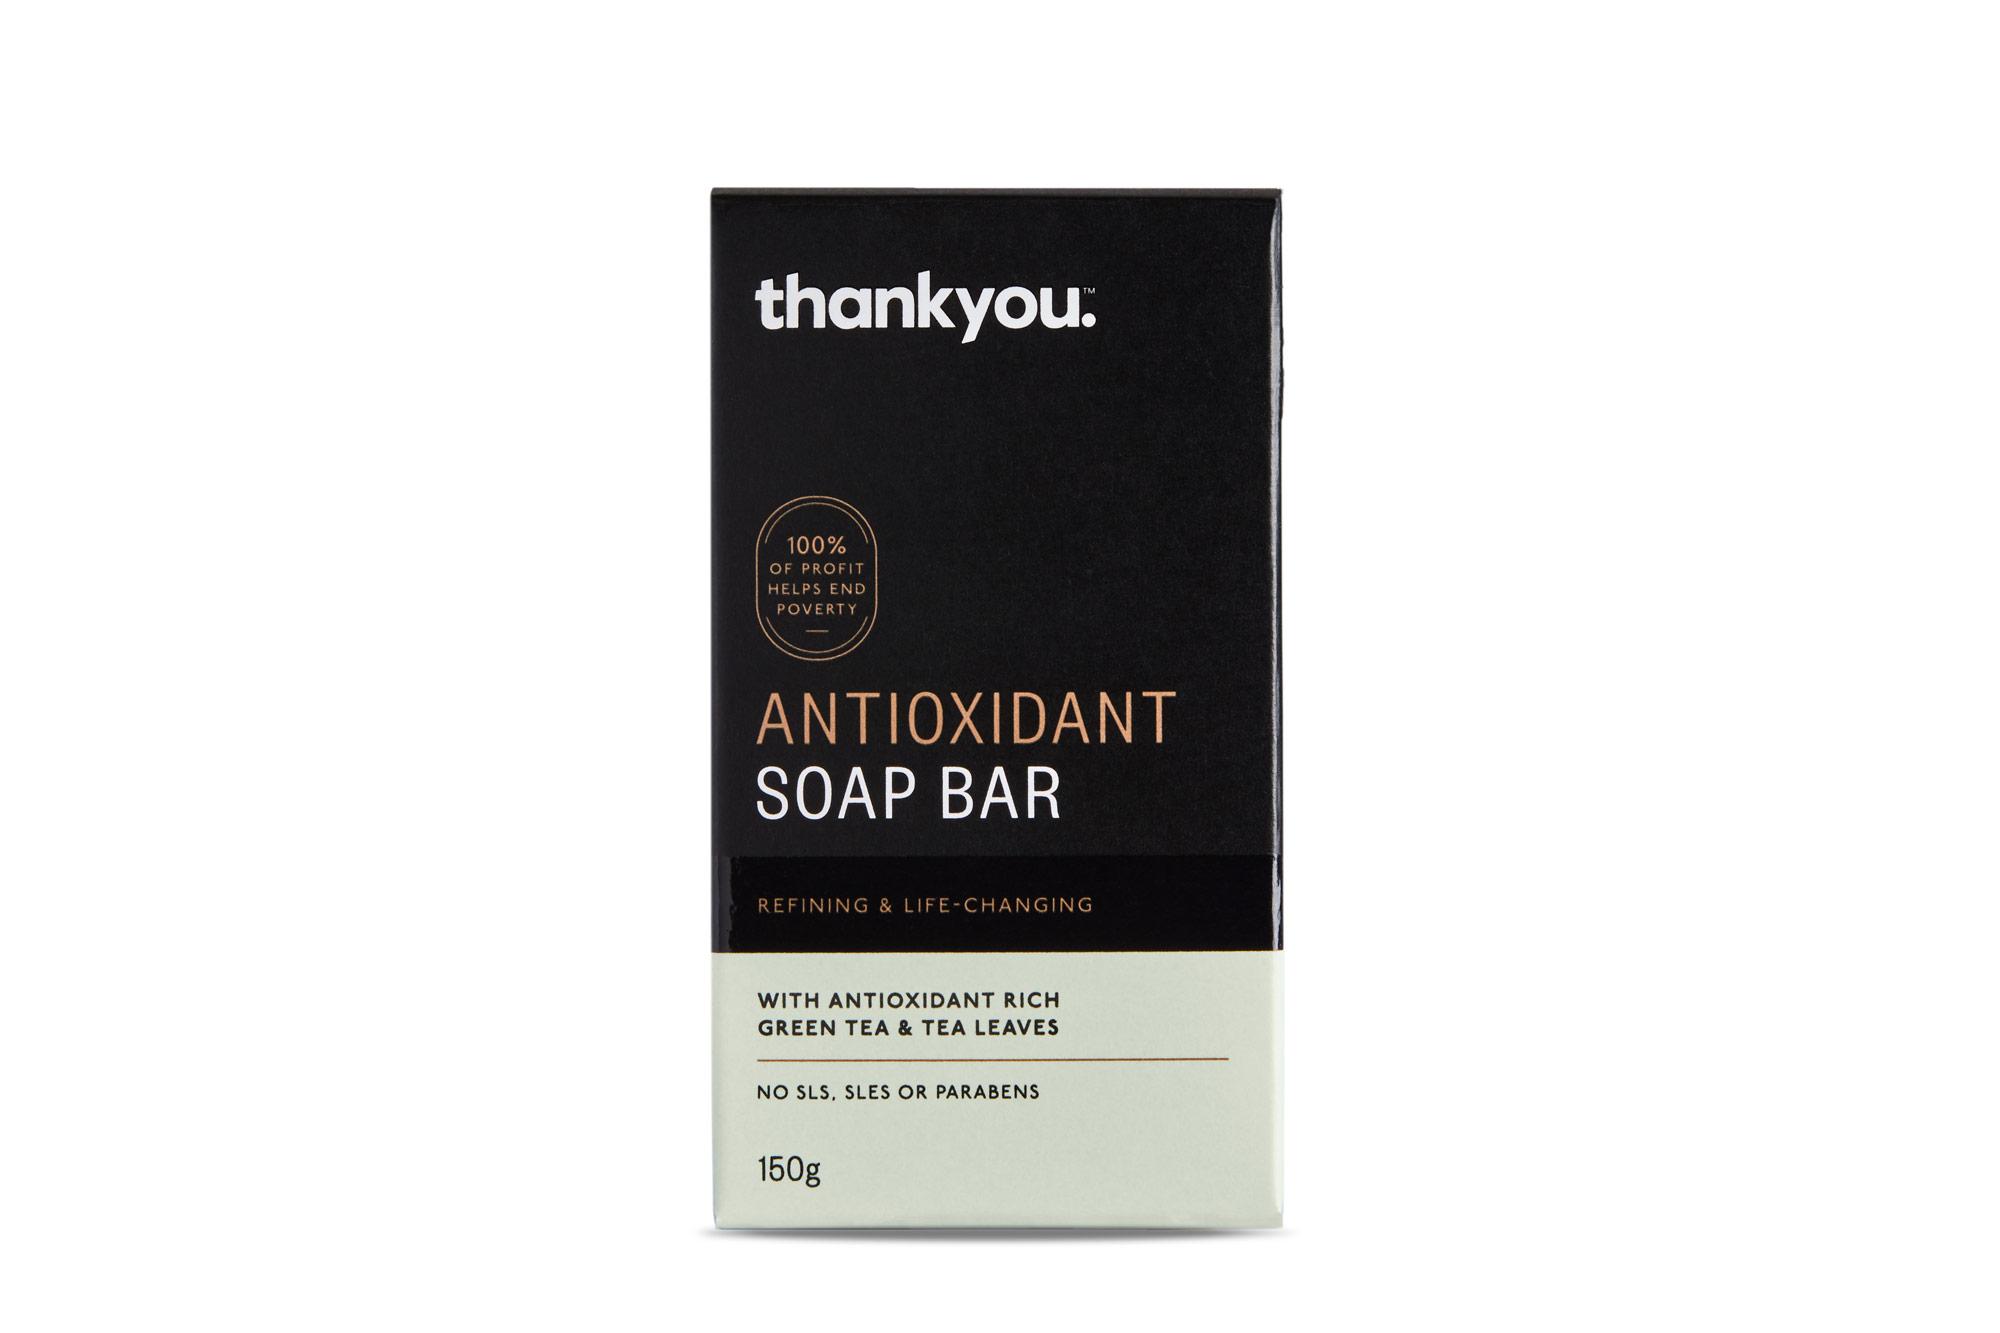 Antioxidant-Soap_Bar_150g.jpg